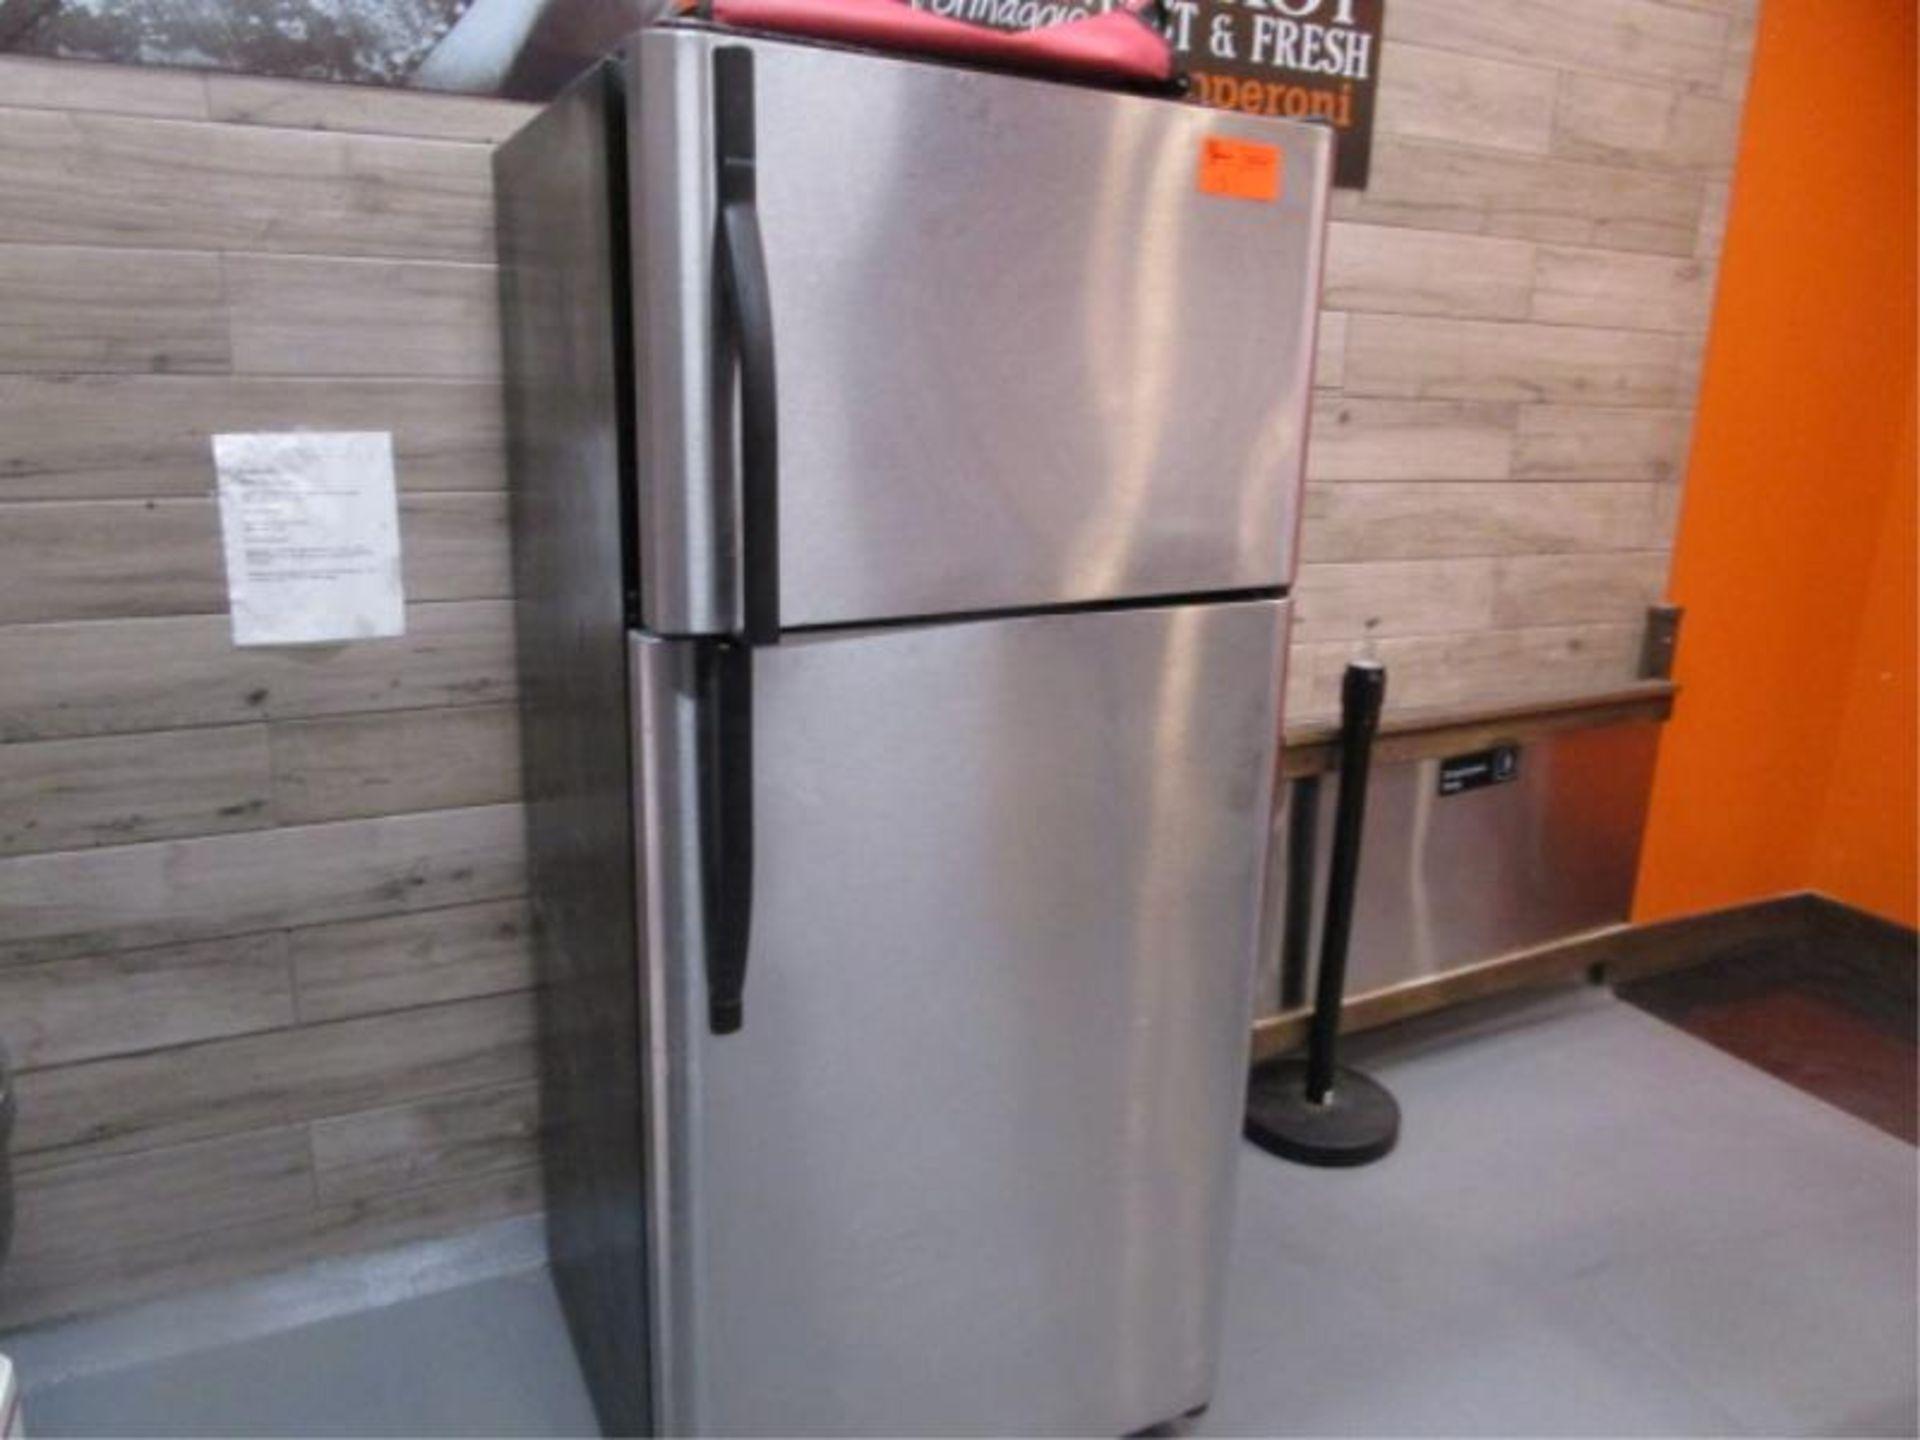 Lot 15 - Kenmore Stainless Steel & Black Enamel Refrigerator, Made 2007, Model: 253-6482340E, SN: BA74023935